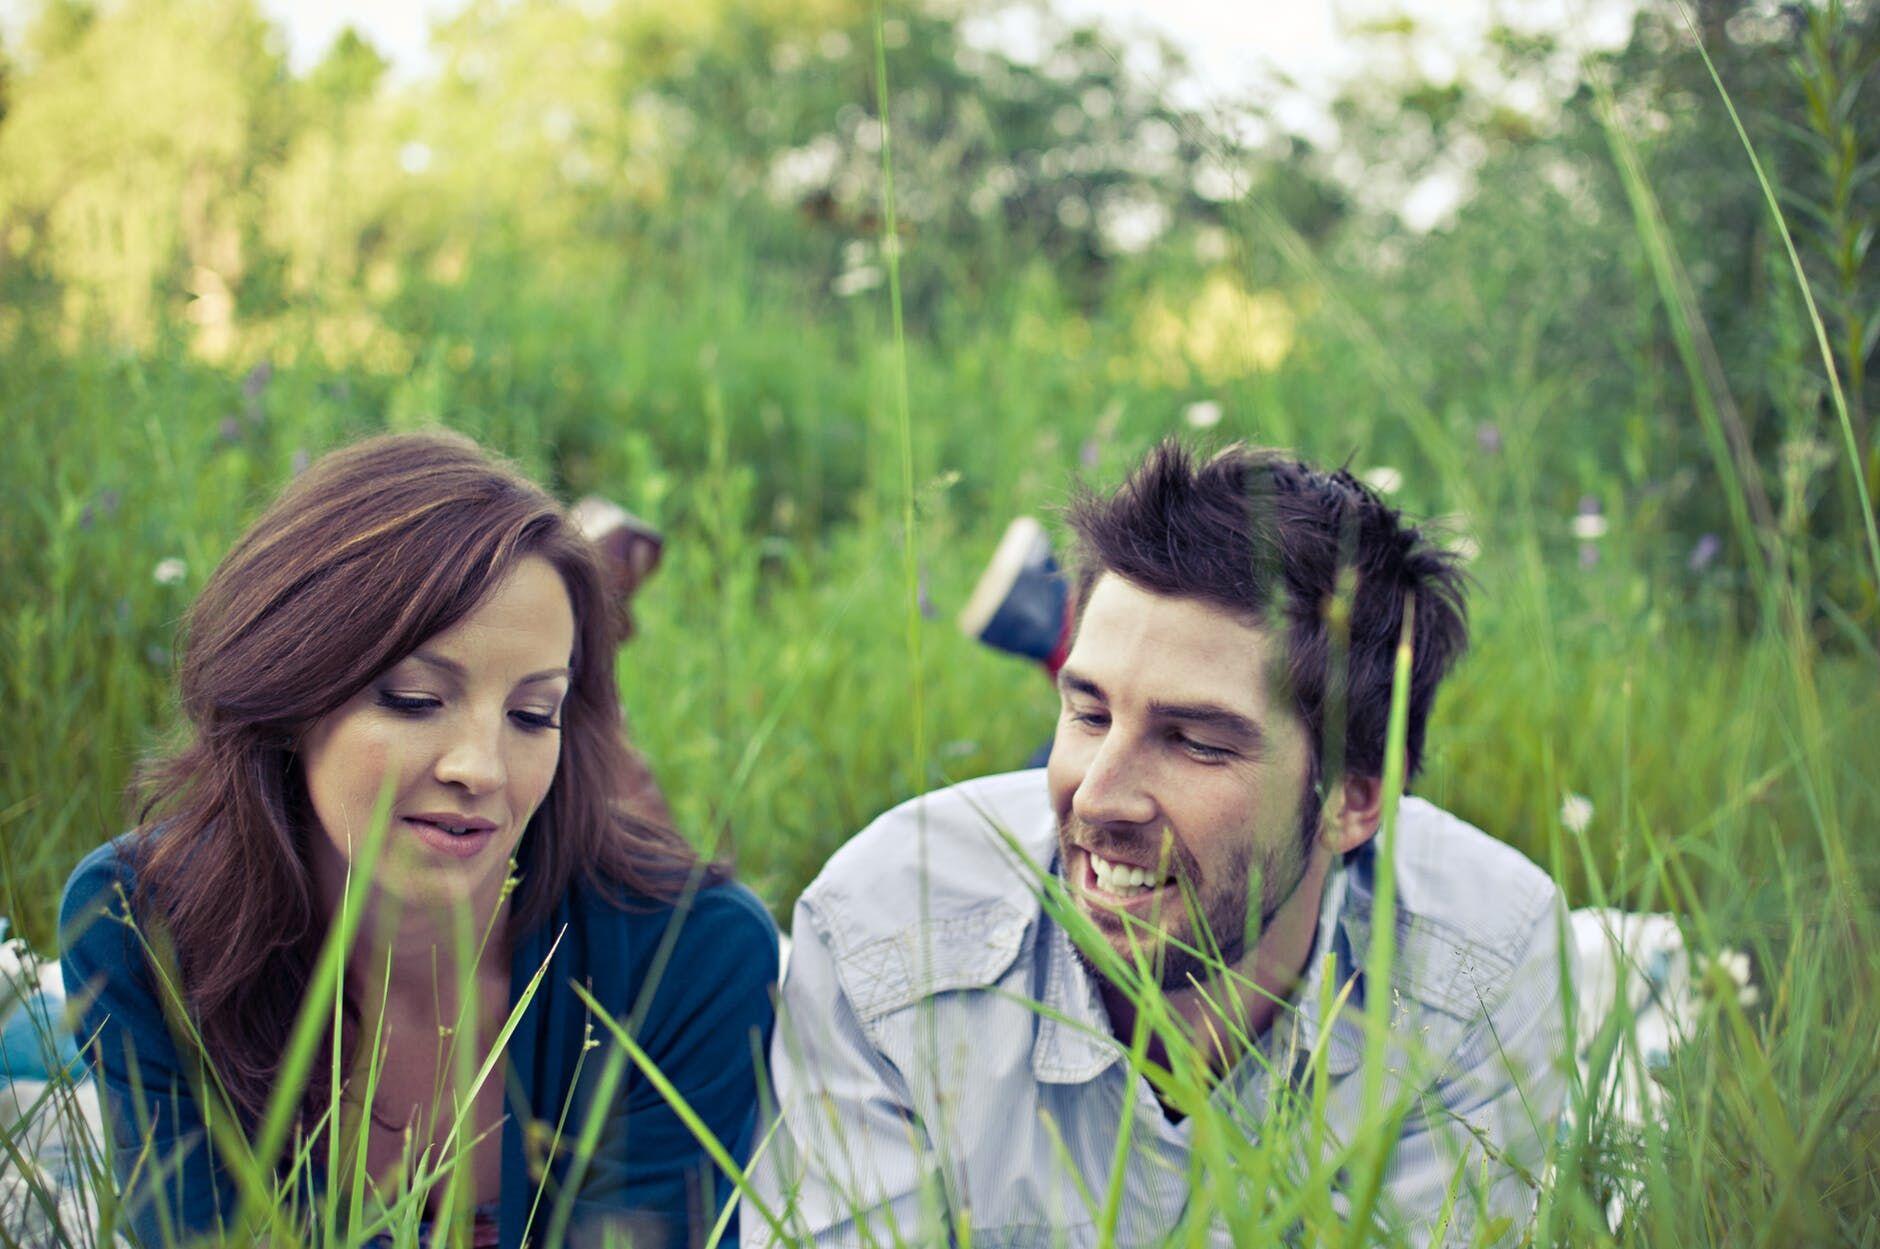 Ini 6 Nasihat Percintaan Paling Top yang Tak Lekang Oleh Waktu